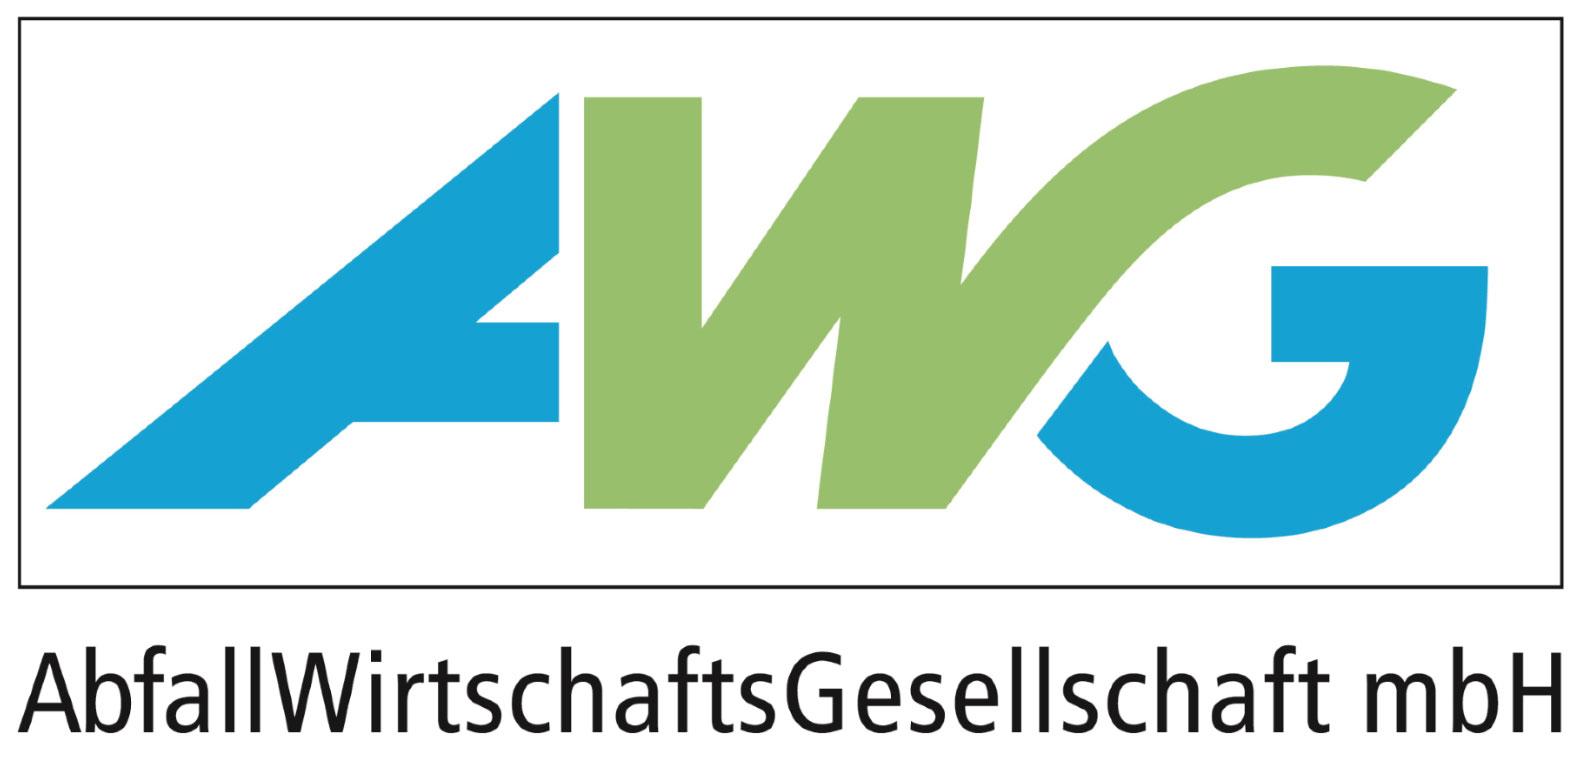 AWG AbfallWirtschaftsGesellschaft mbH in Bassum